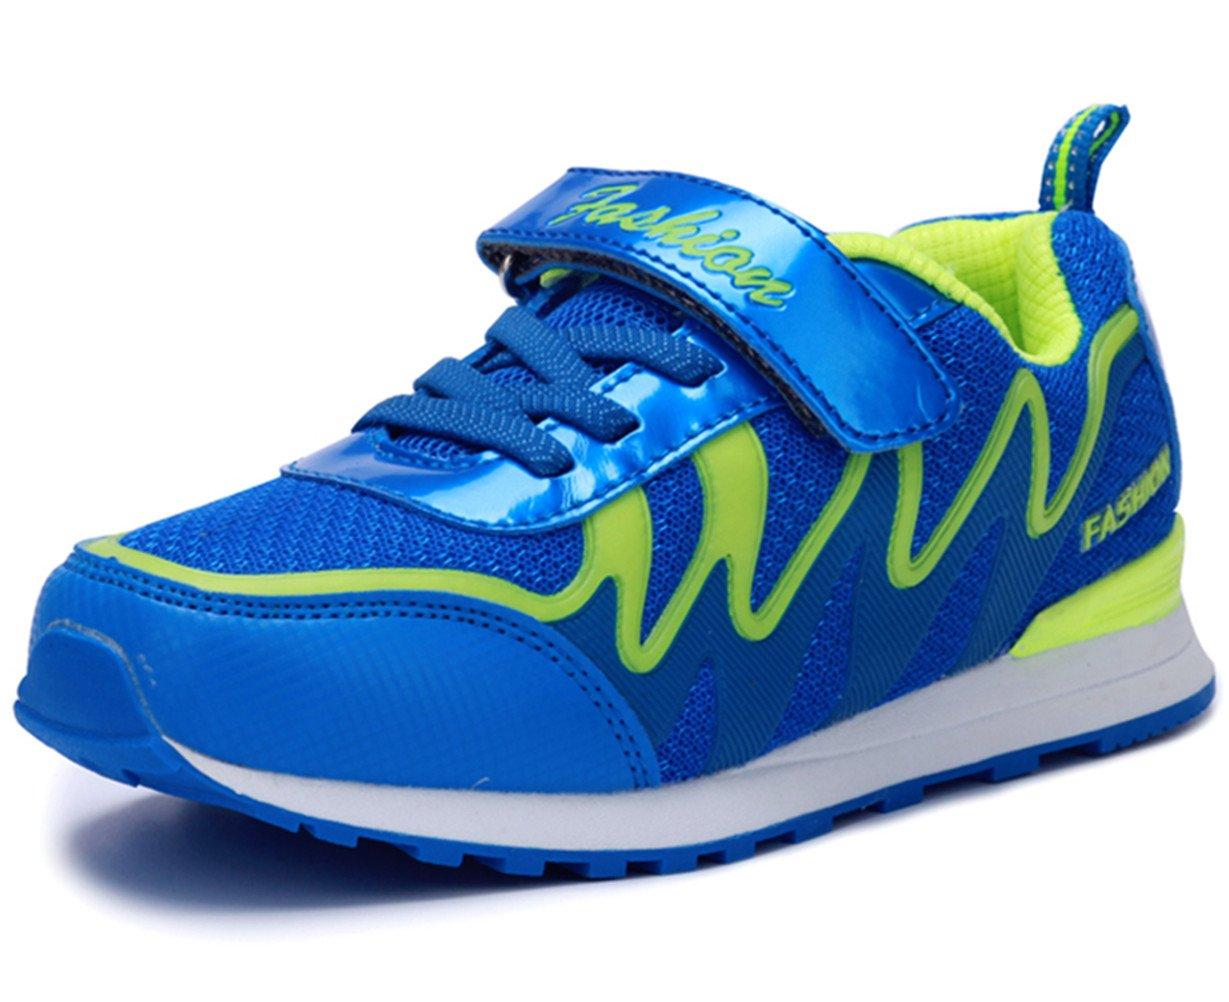 DADAWEN Boys & Girls Lightweight Sneakers Breathable Athletic Running Shoes(Toddler/Little Kid/Big Kid) Blue US Size 5 M Big Kid